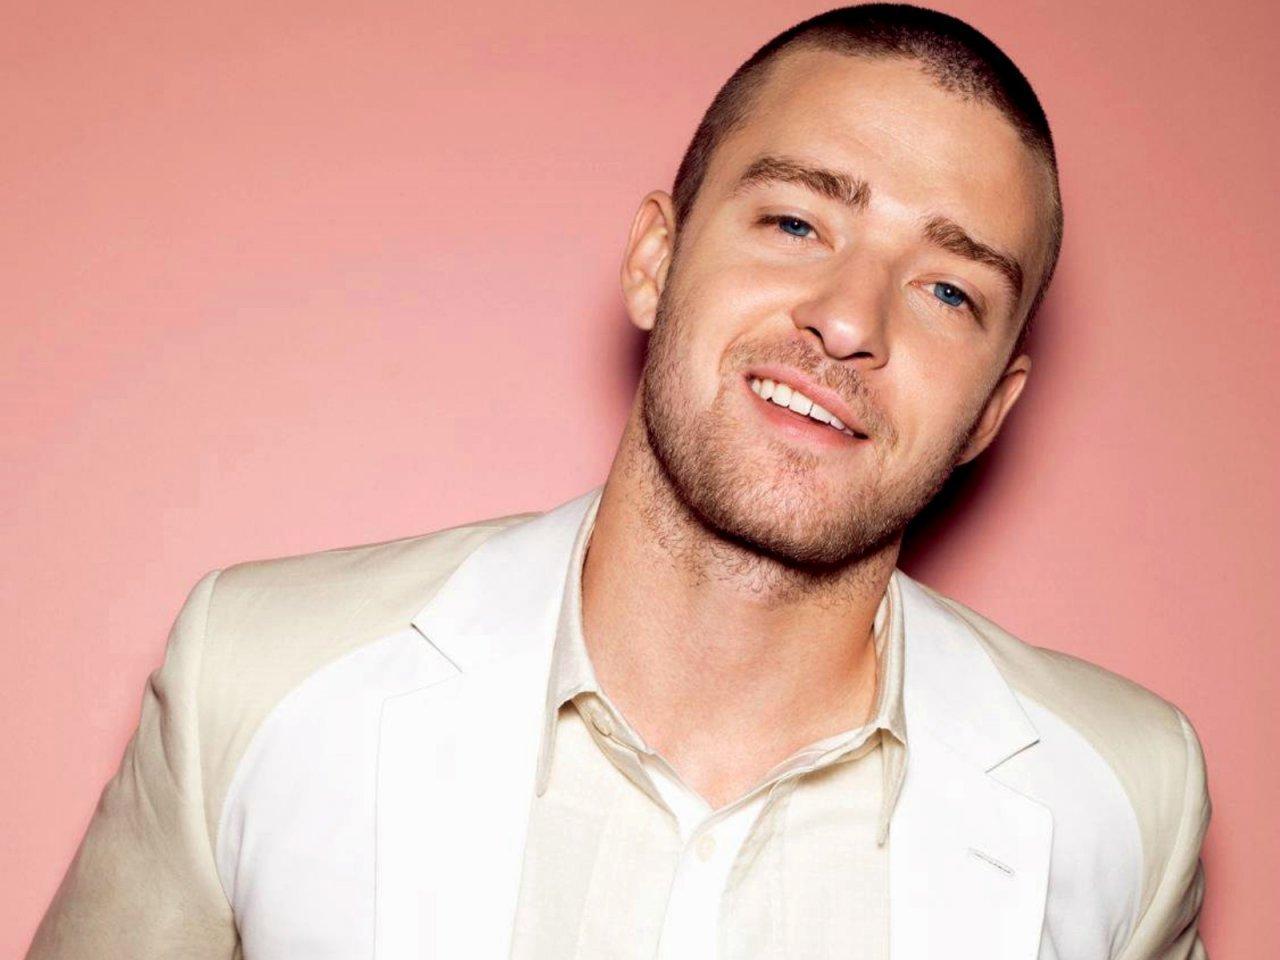 J.T. - Justin Timberlake Wallpaper (18476458) - Fanpop